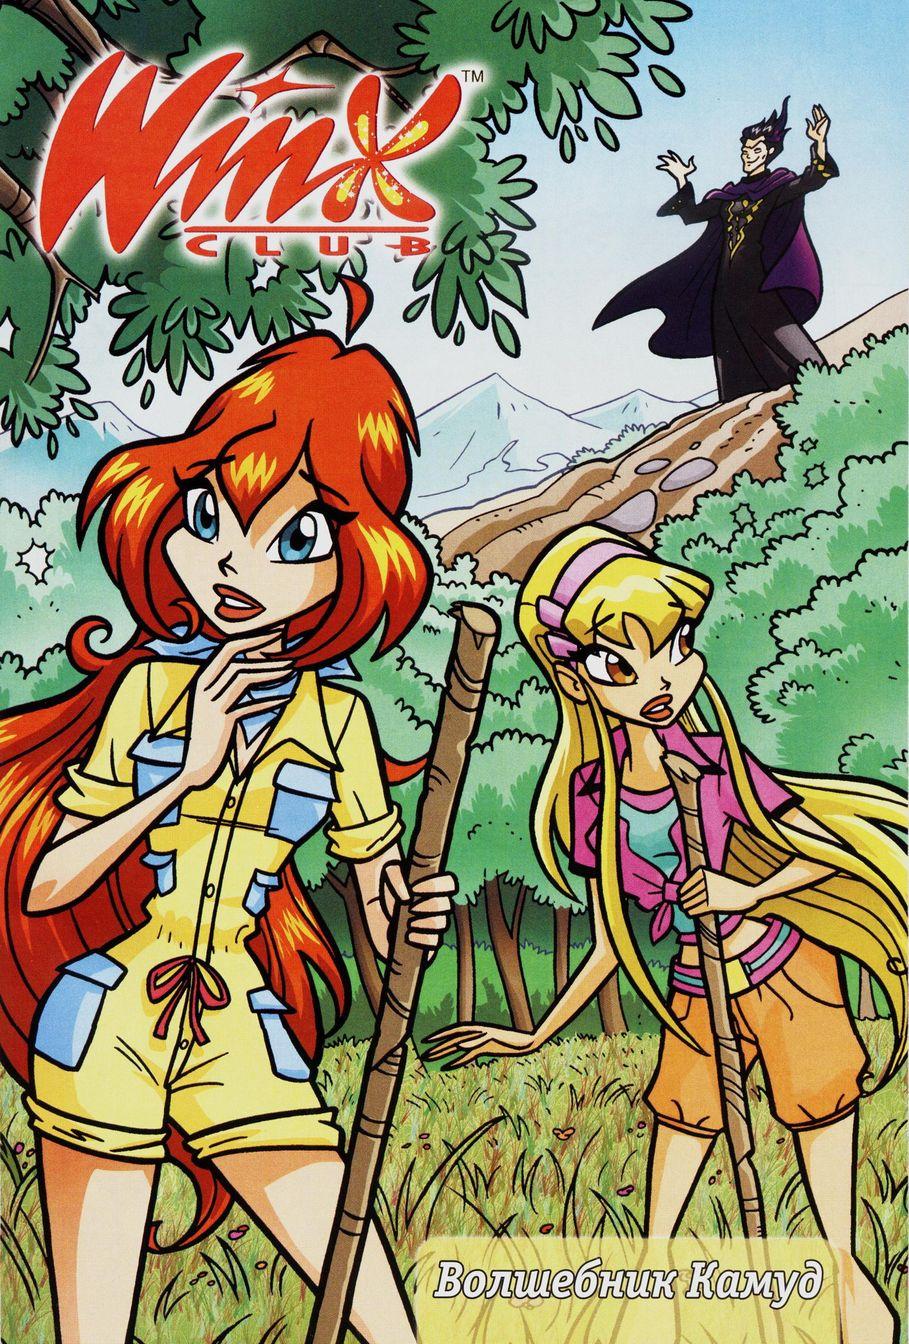 Комикс Винкс Winx - Волшебник Камуд (Журнал Винкс №6 2011) - стр. 15